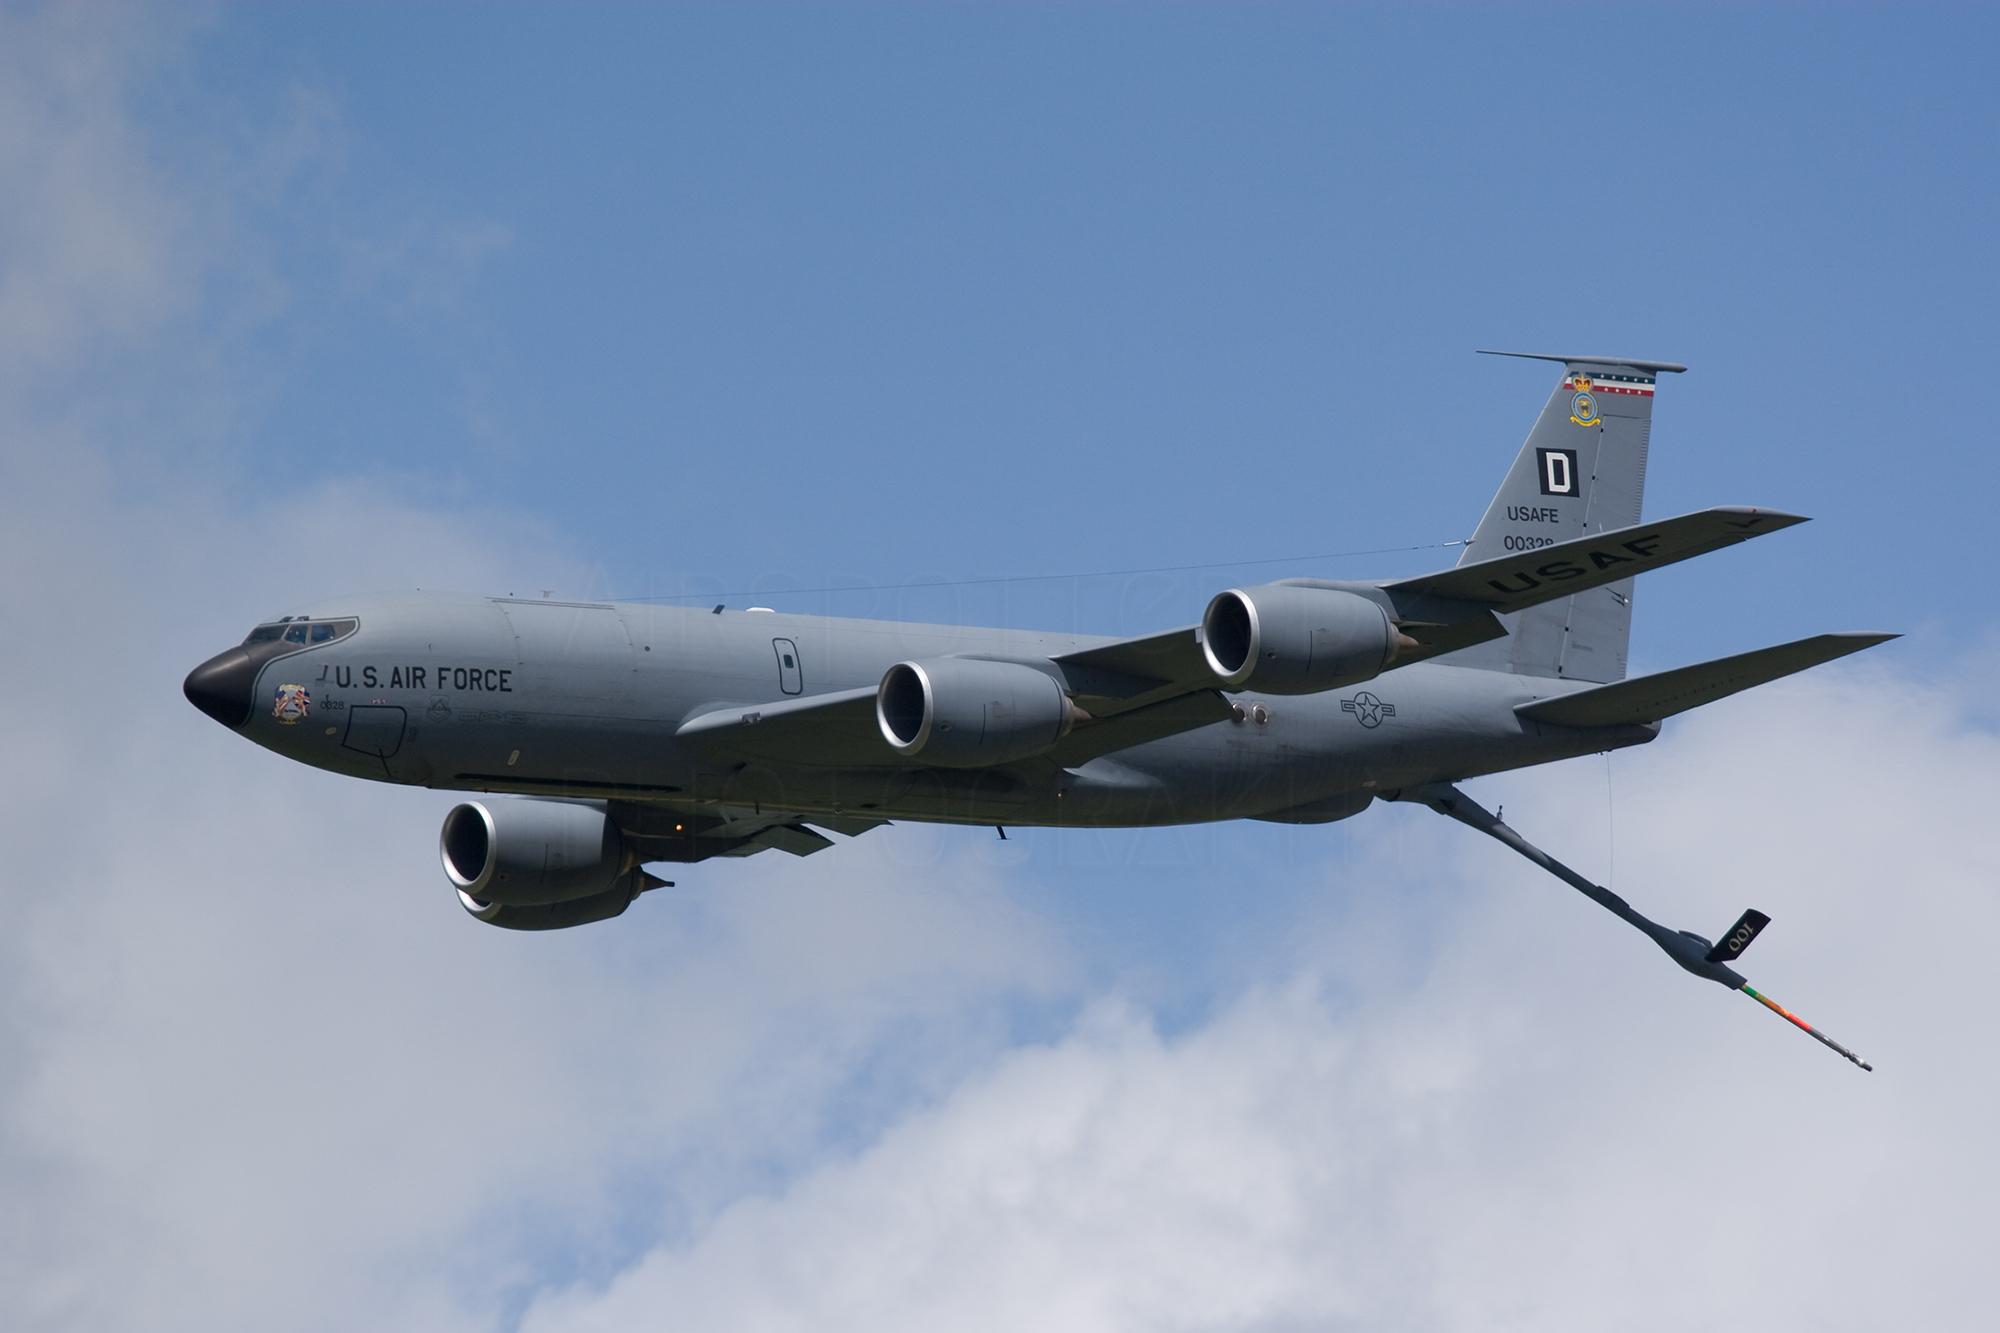 Airspoter.de 2008 Kleine Brogel belgium Boeing KC-135 Stratotanker